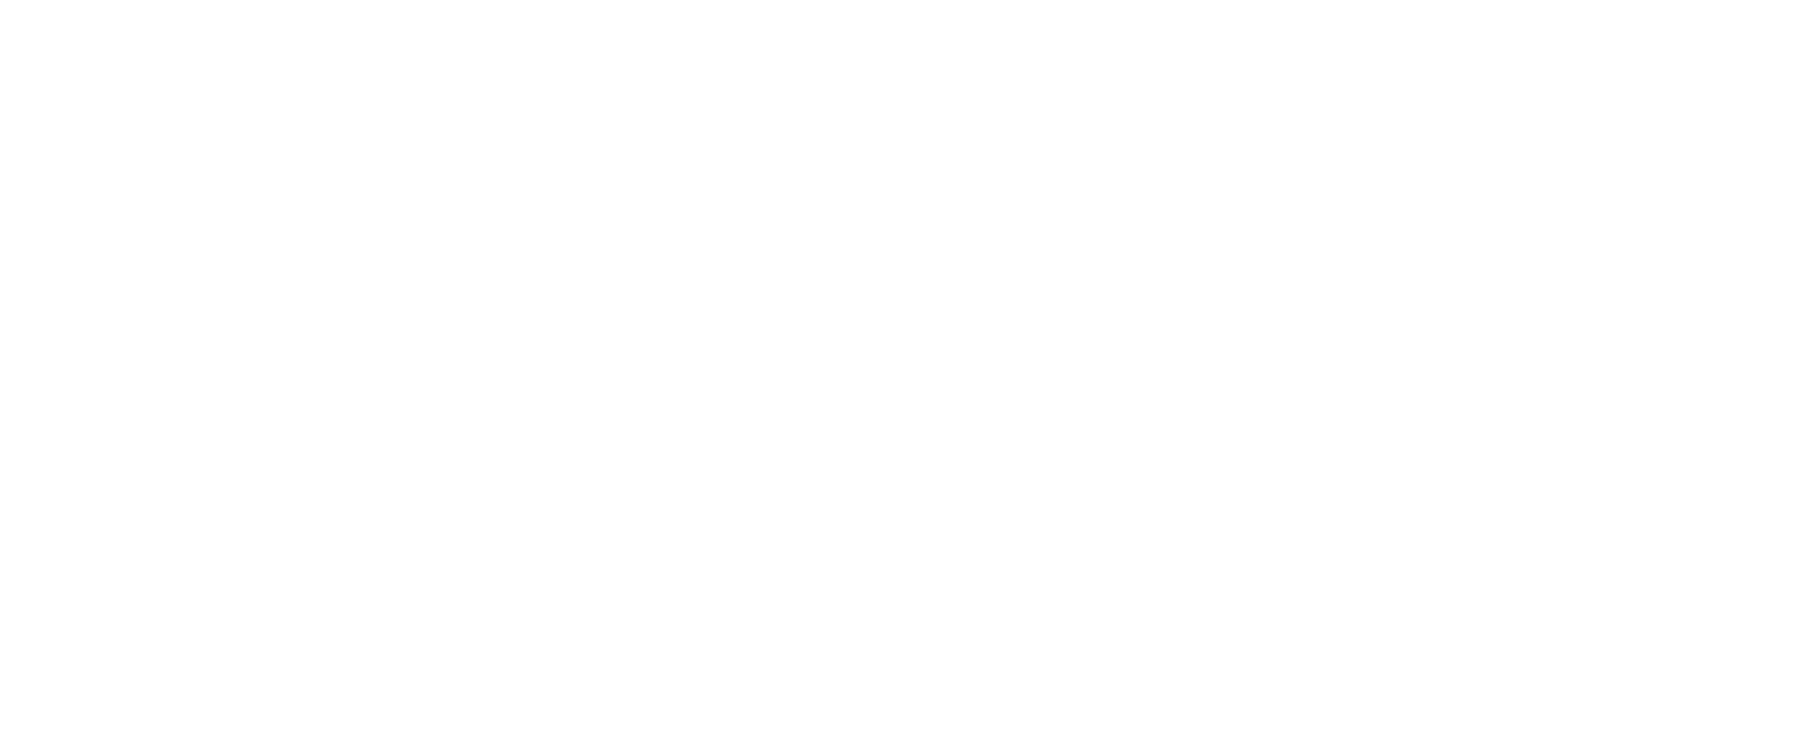 UITS Tech2U